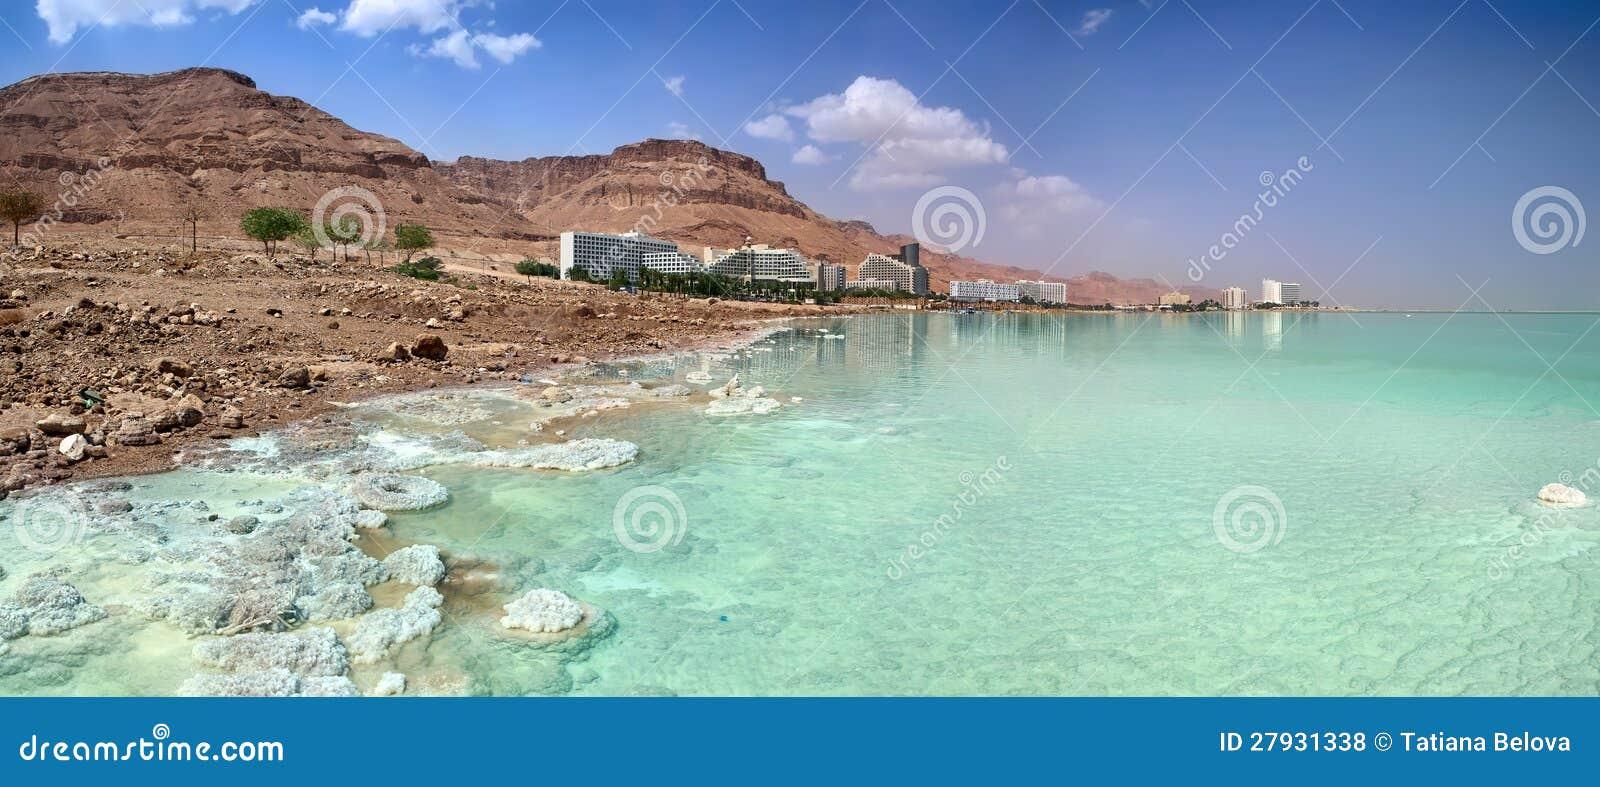 Costa de mar inoperante. Hotéis. Israel